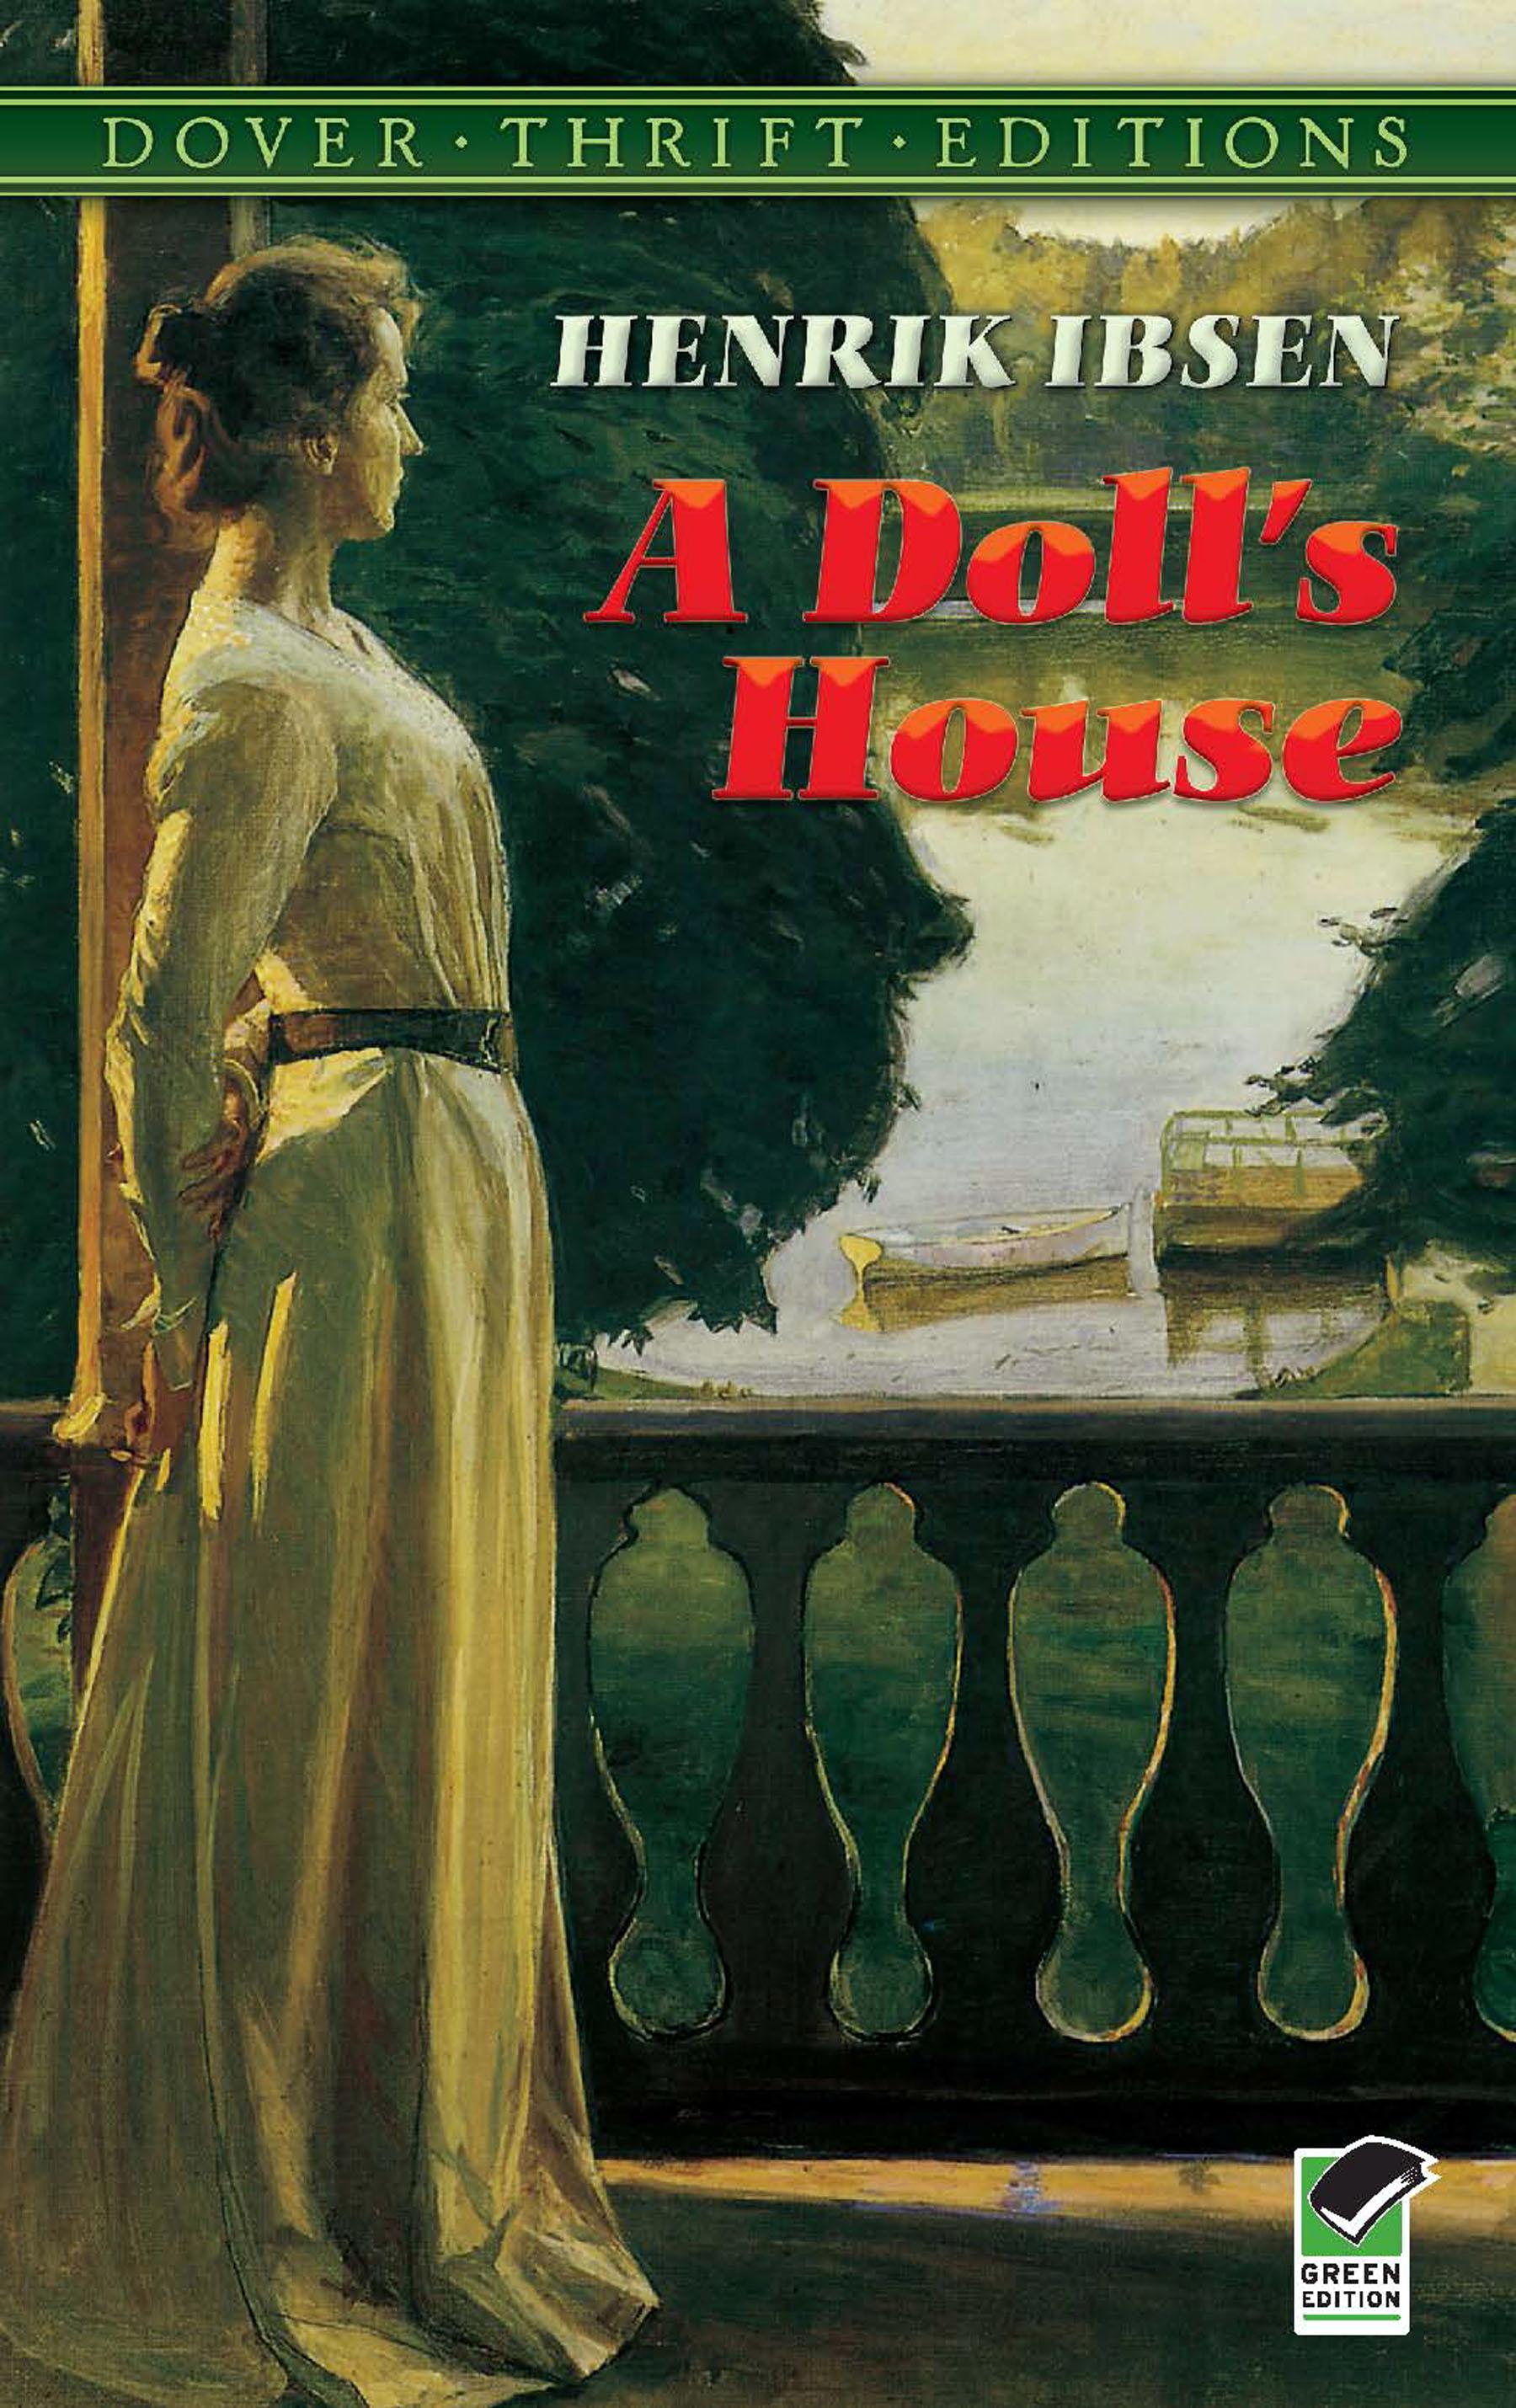 essay on a dollhouse by henrik ibsen